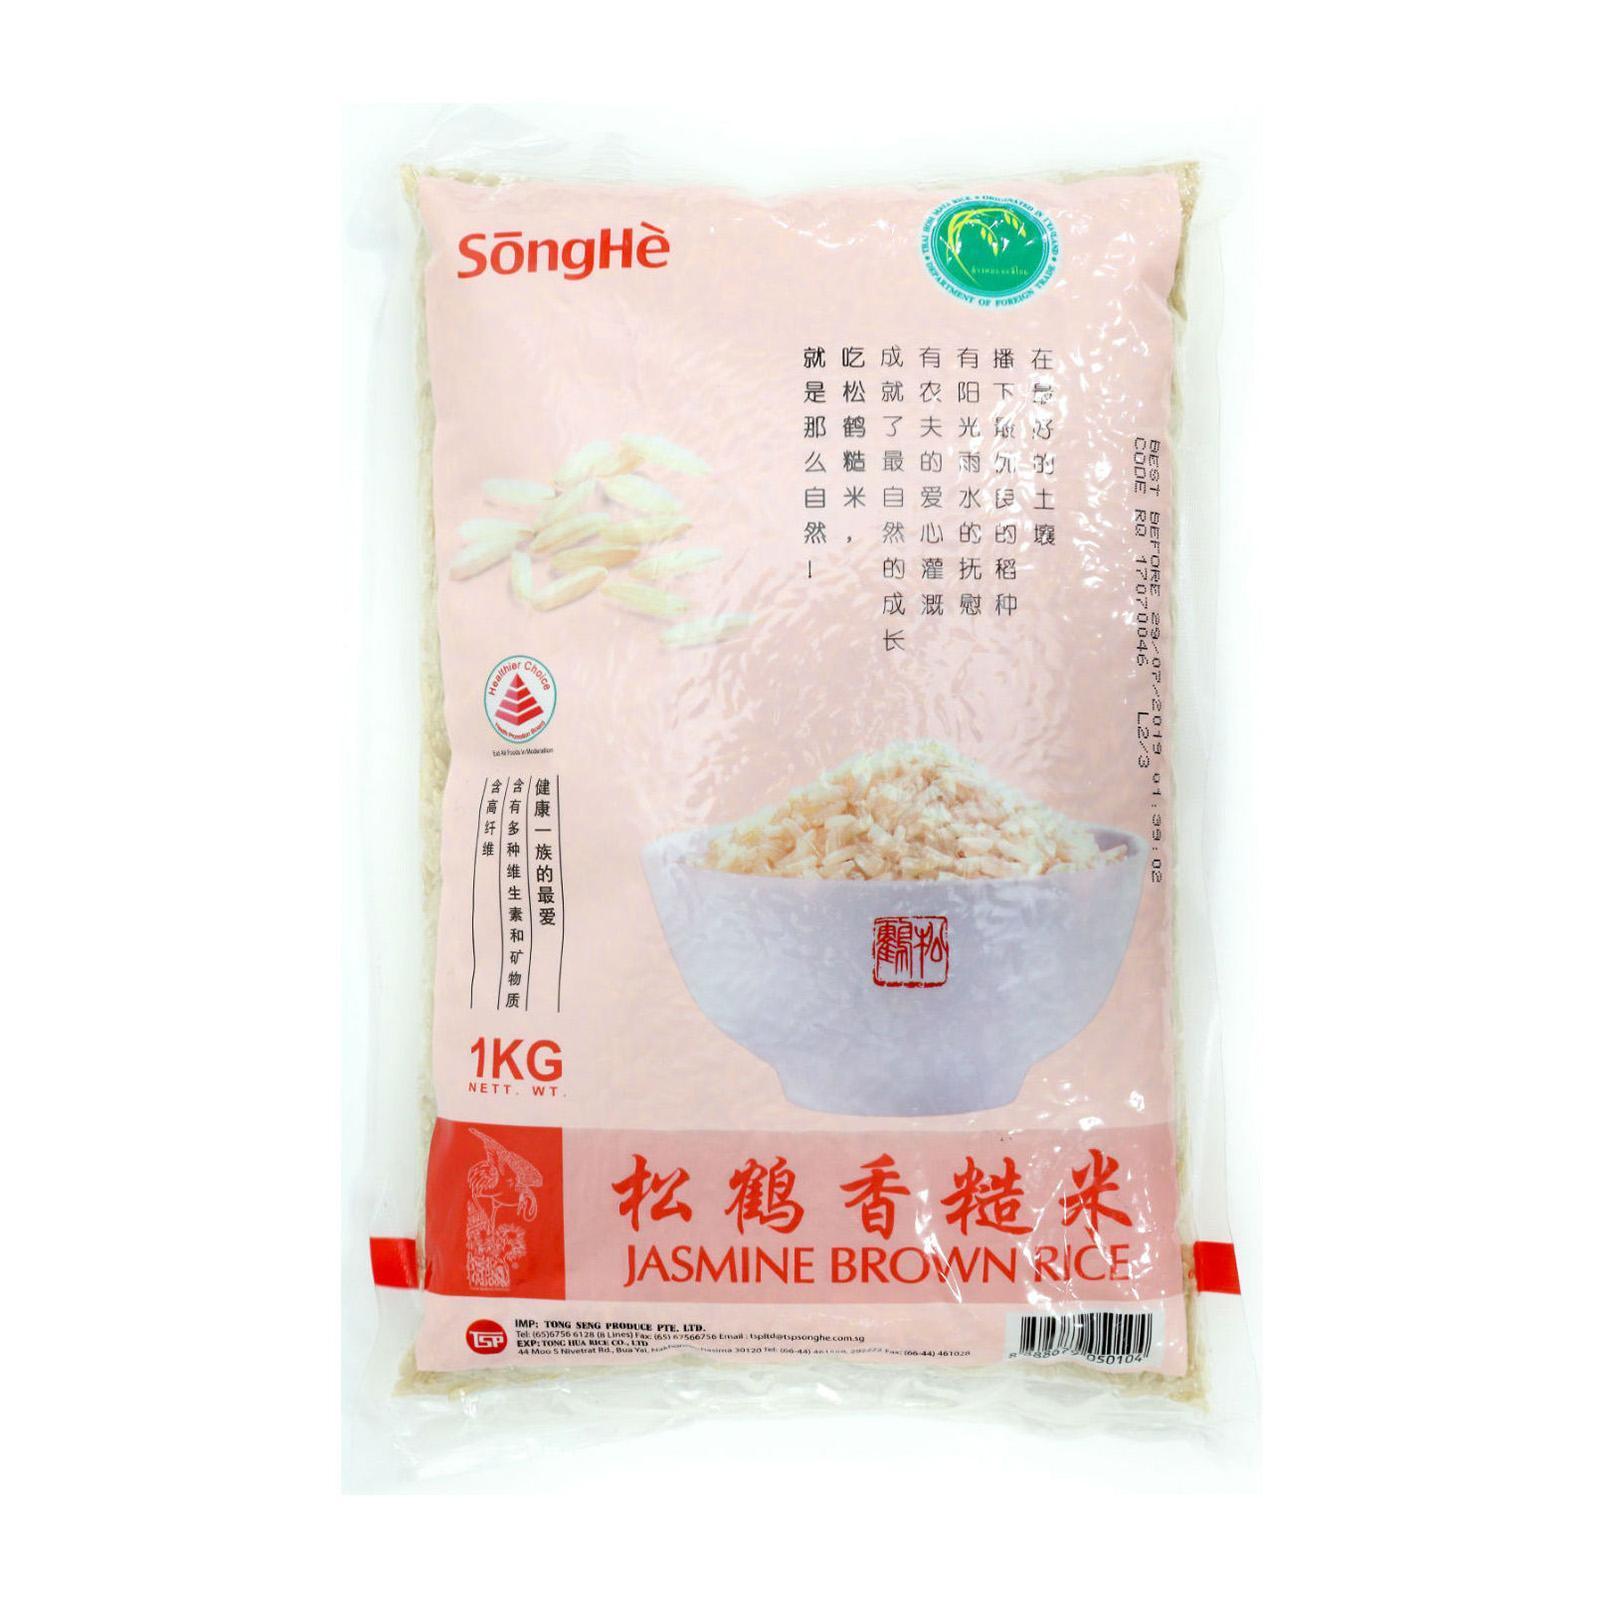 SongHe Jasmine Brown Rice 1Kg